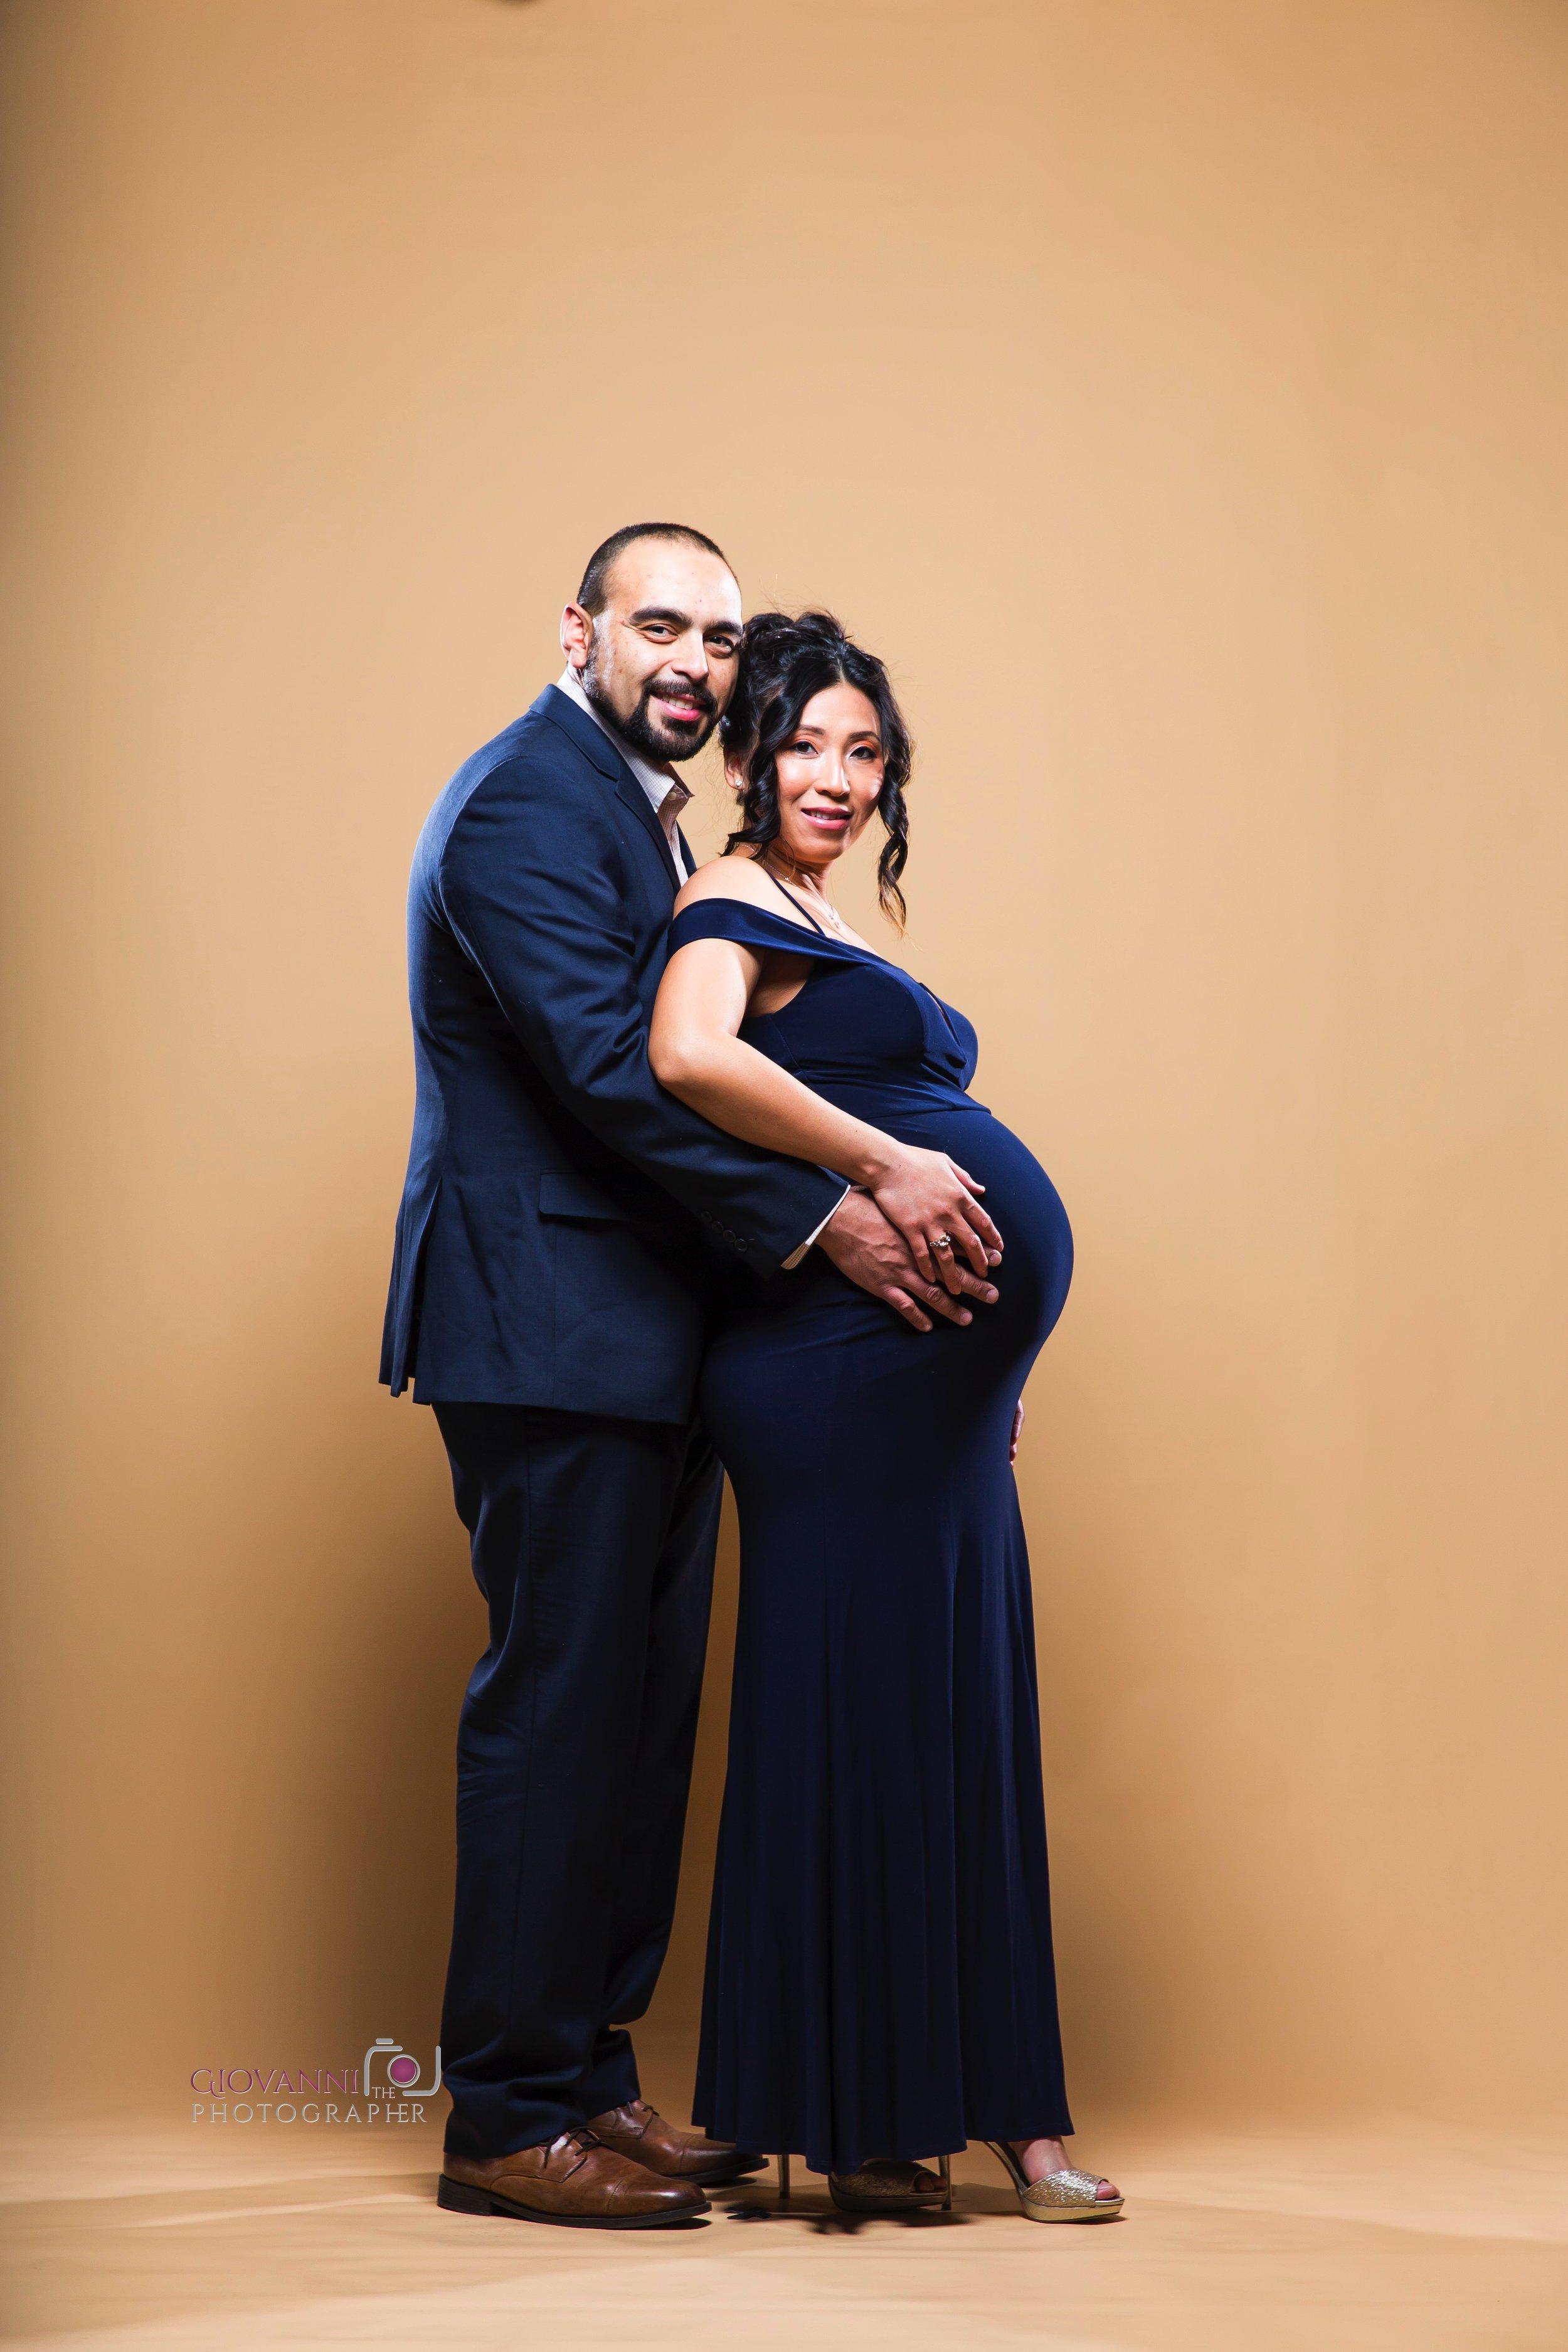 314A9291 Giovanni The Photographer Best Boston Family Maternity Photography Studio Rental WM100.jpg